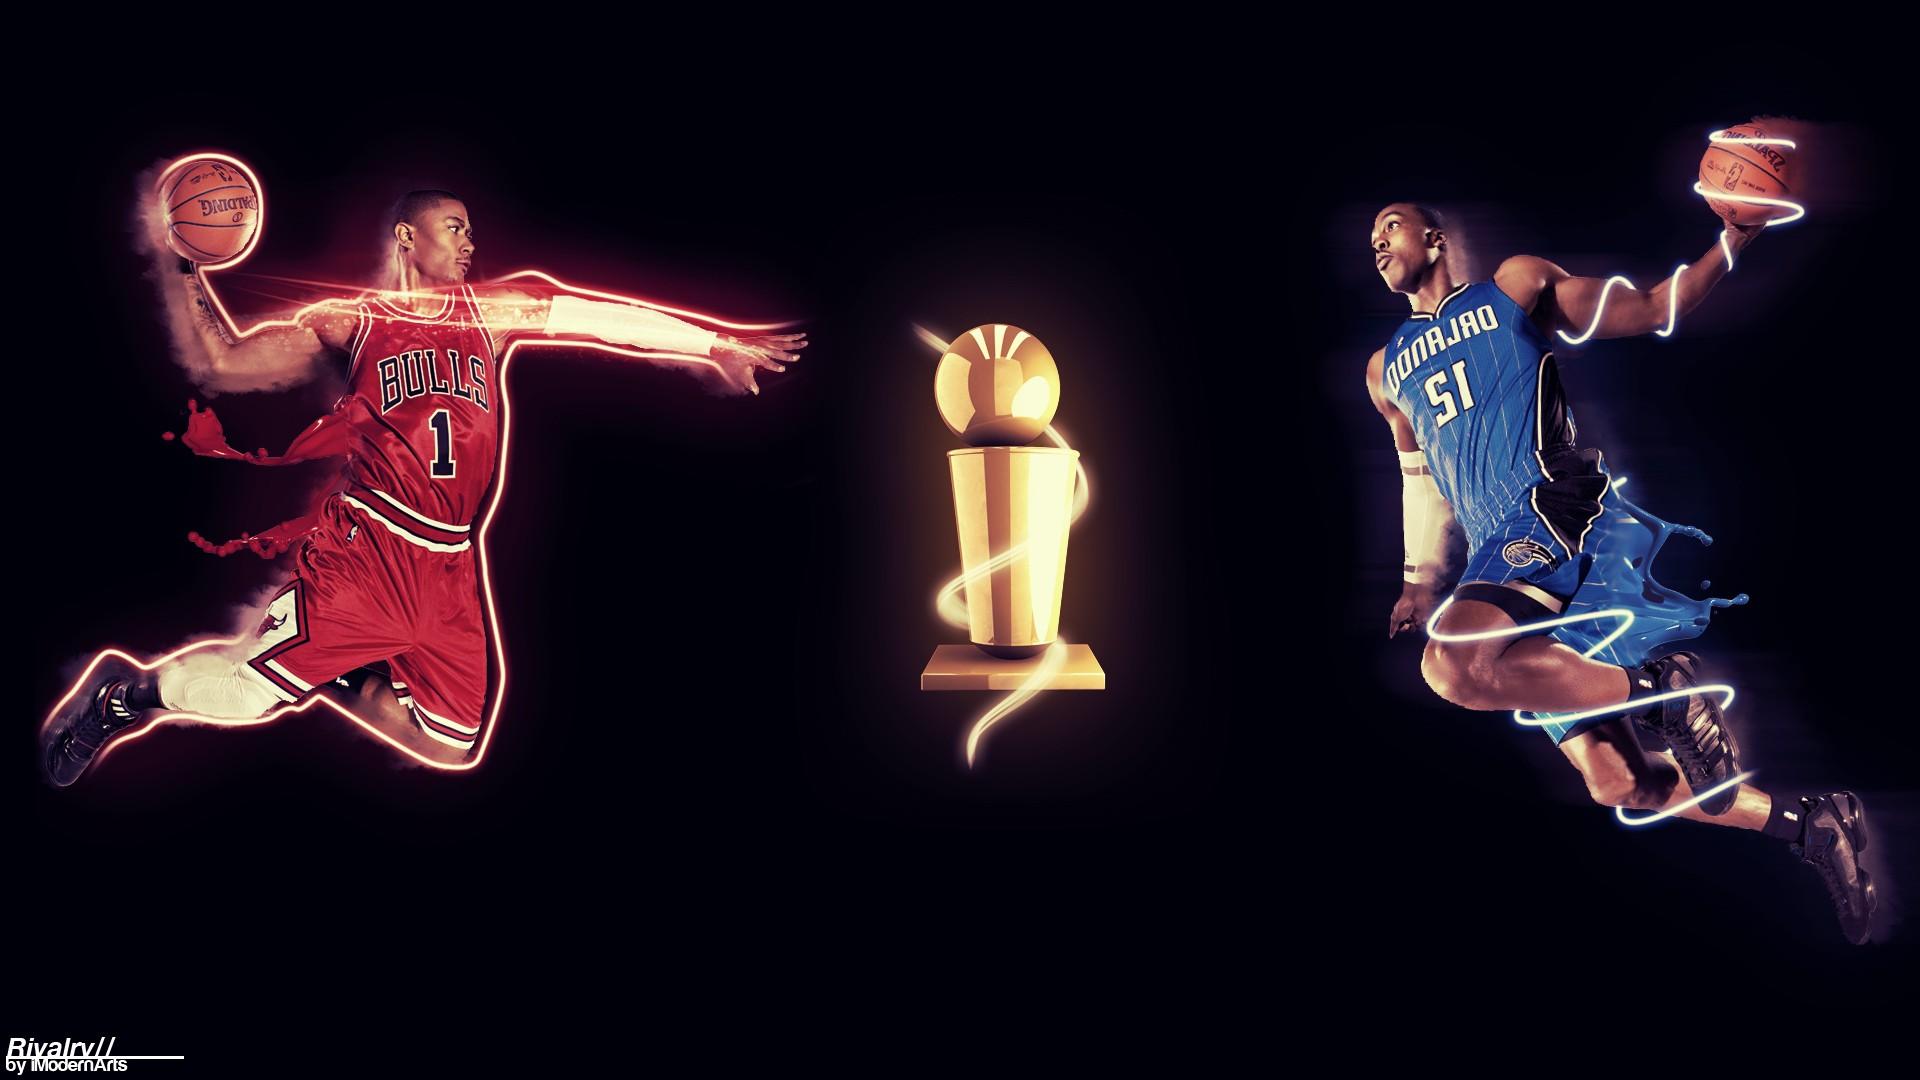 Download Nba Basketball Wallpaper Hd Backgrounds Download Itl Cat